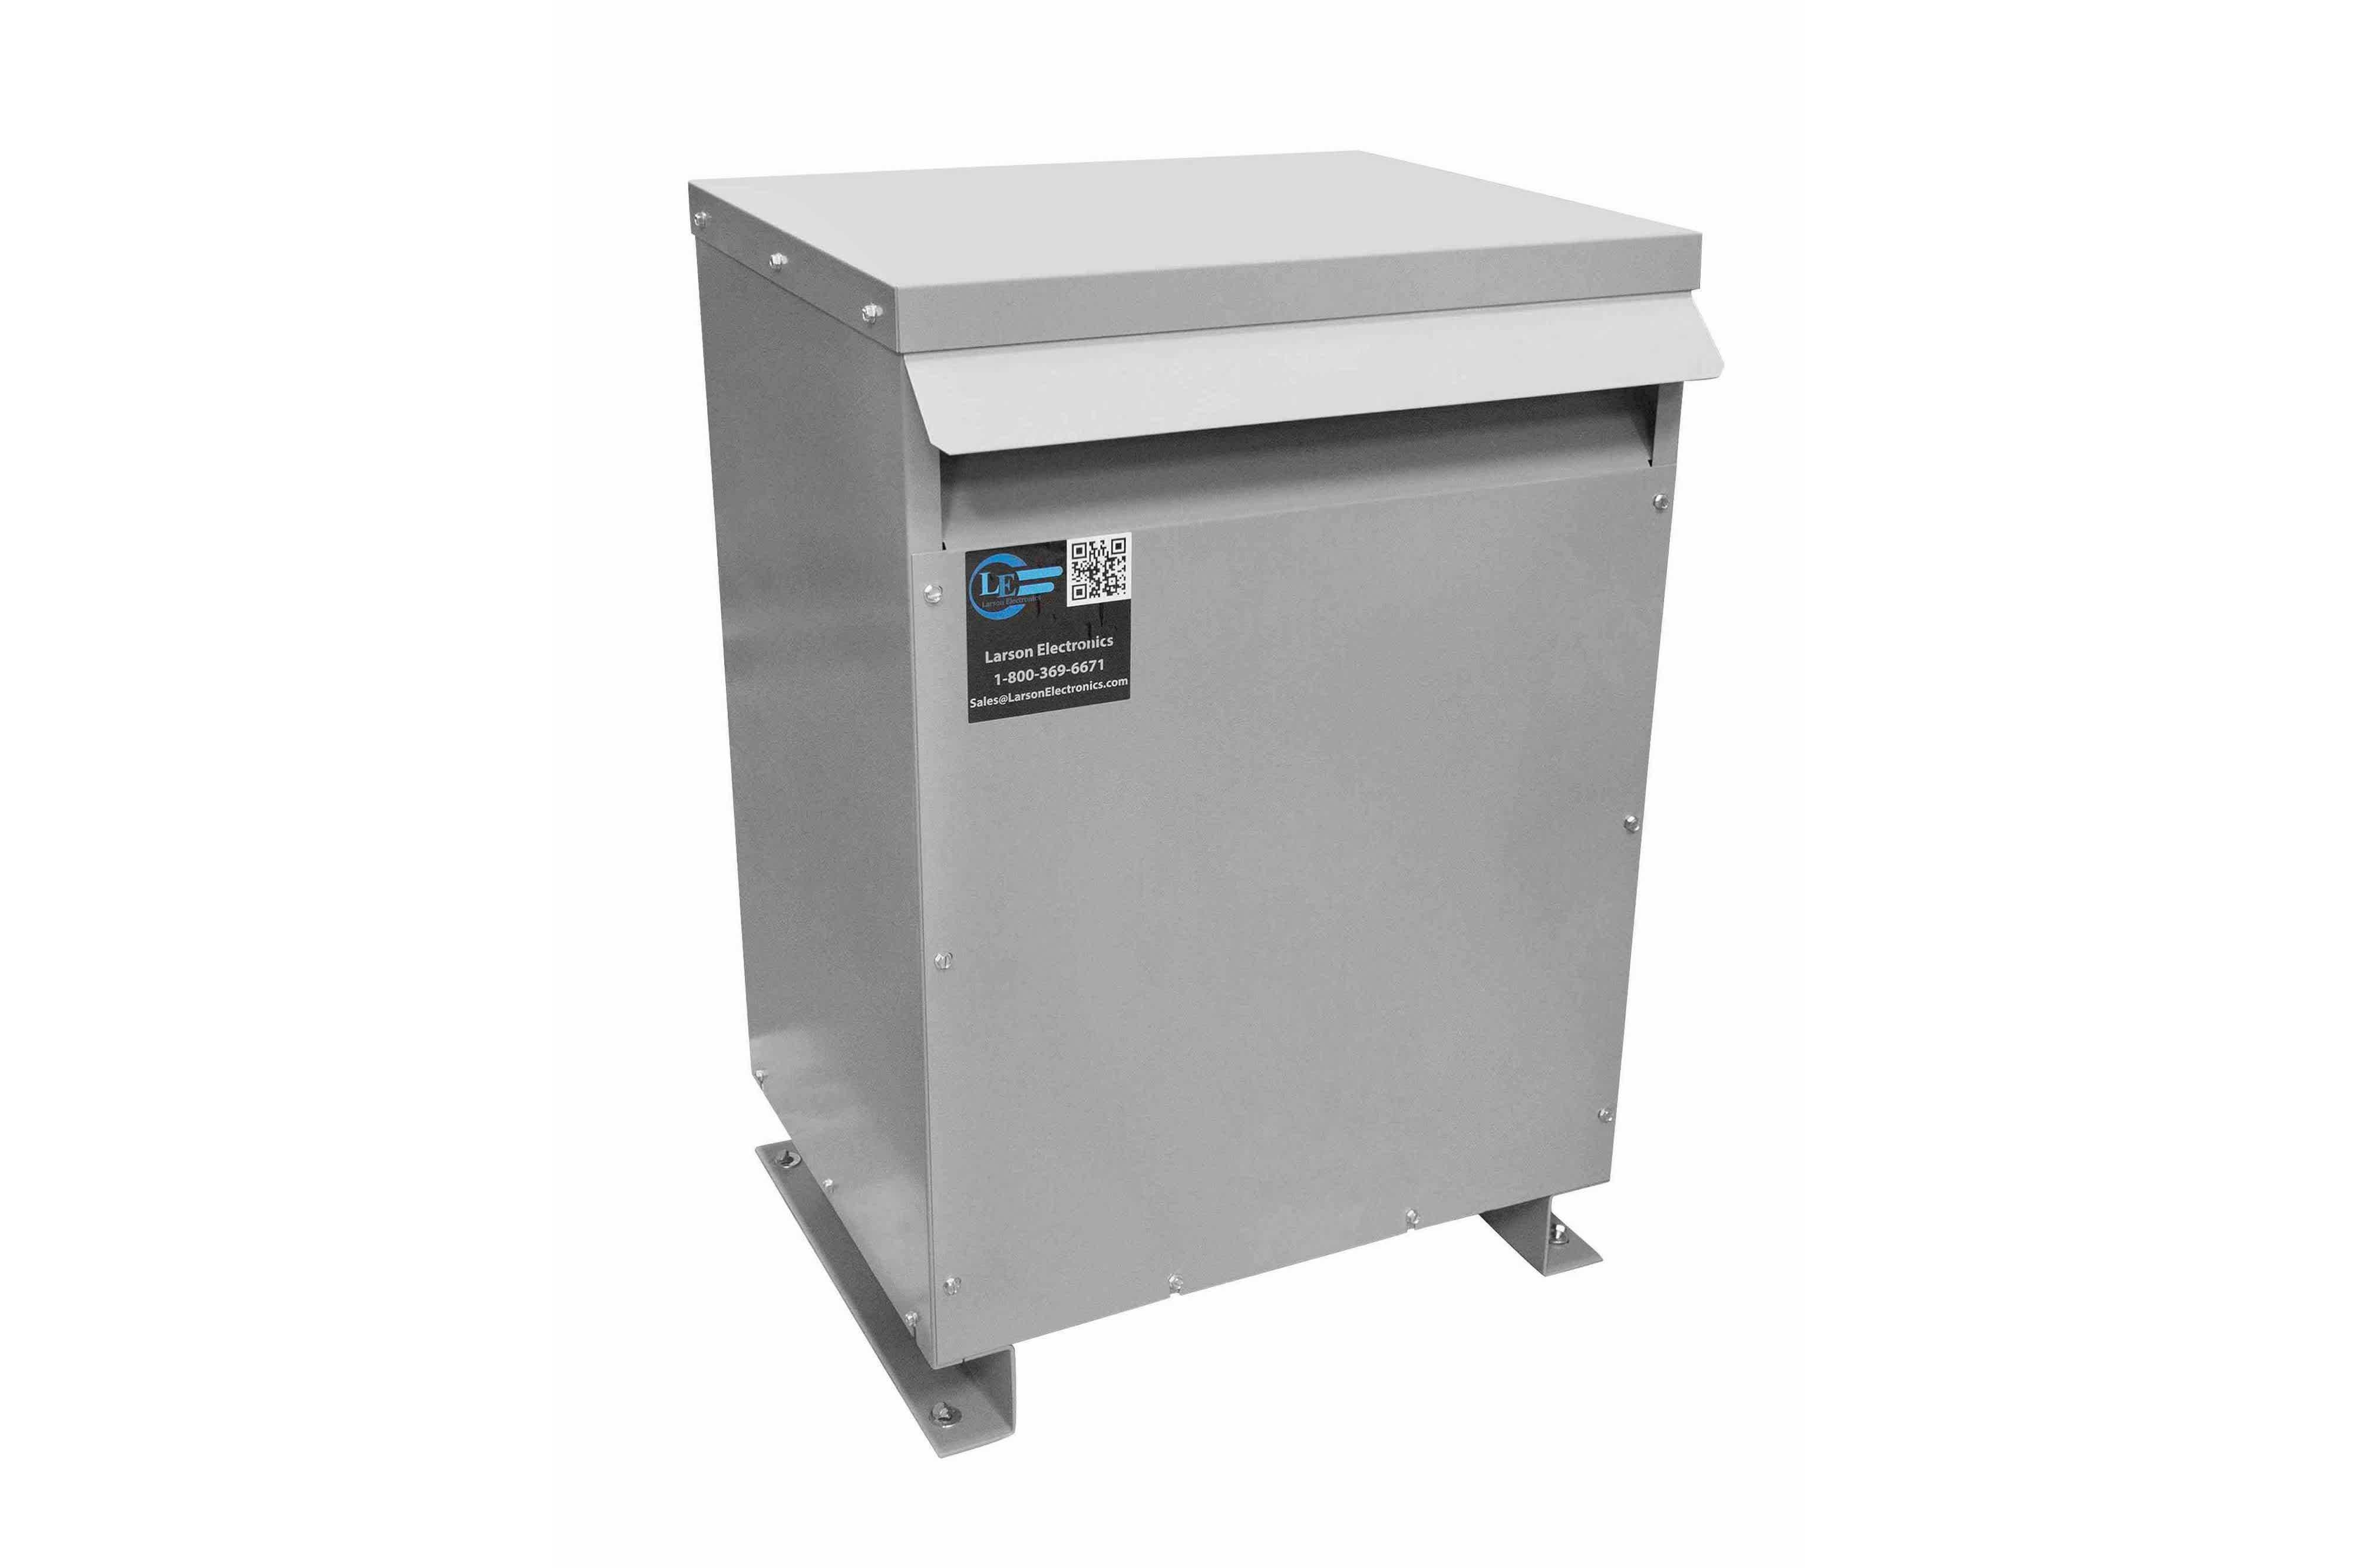 37.5 kVA 3PH Isolation Transformer, 460V Wye Primary, 380Y/220 Wye-N Secondary, N3R, Ventilated, 60 Hz